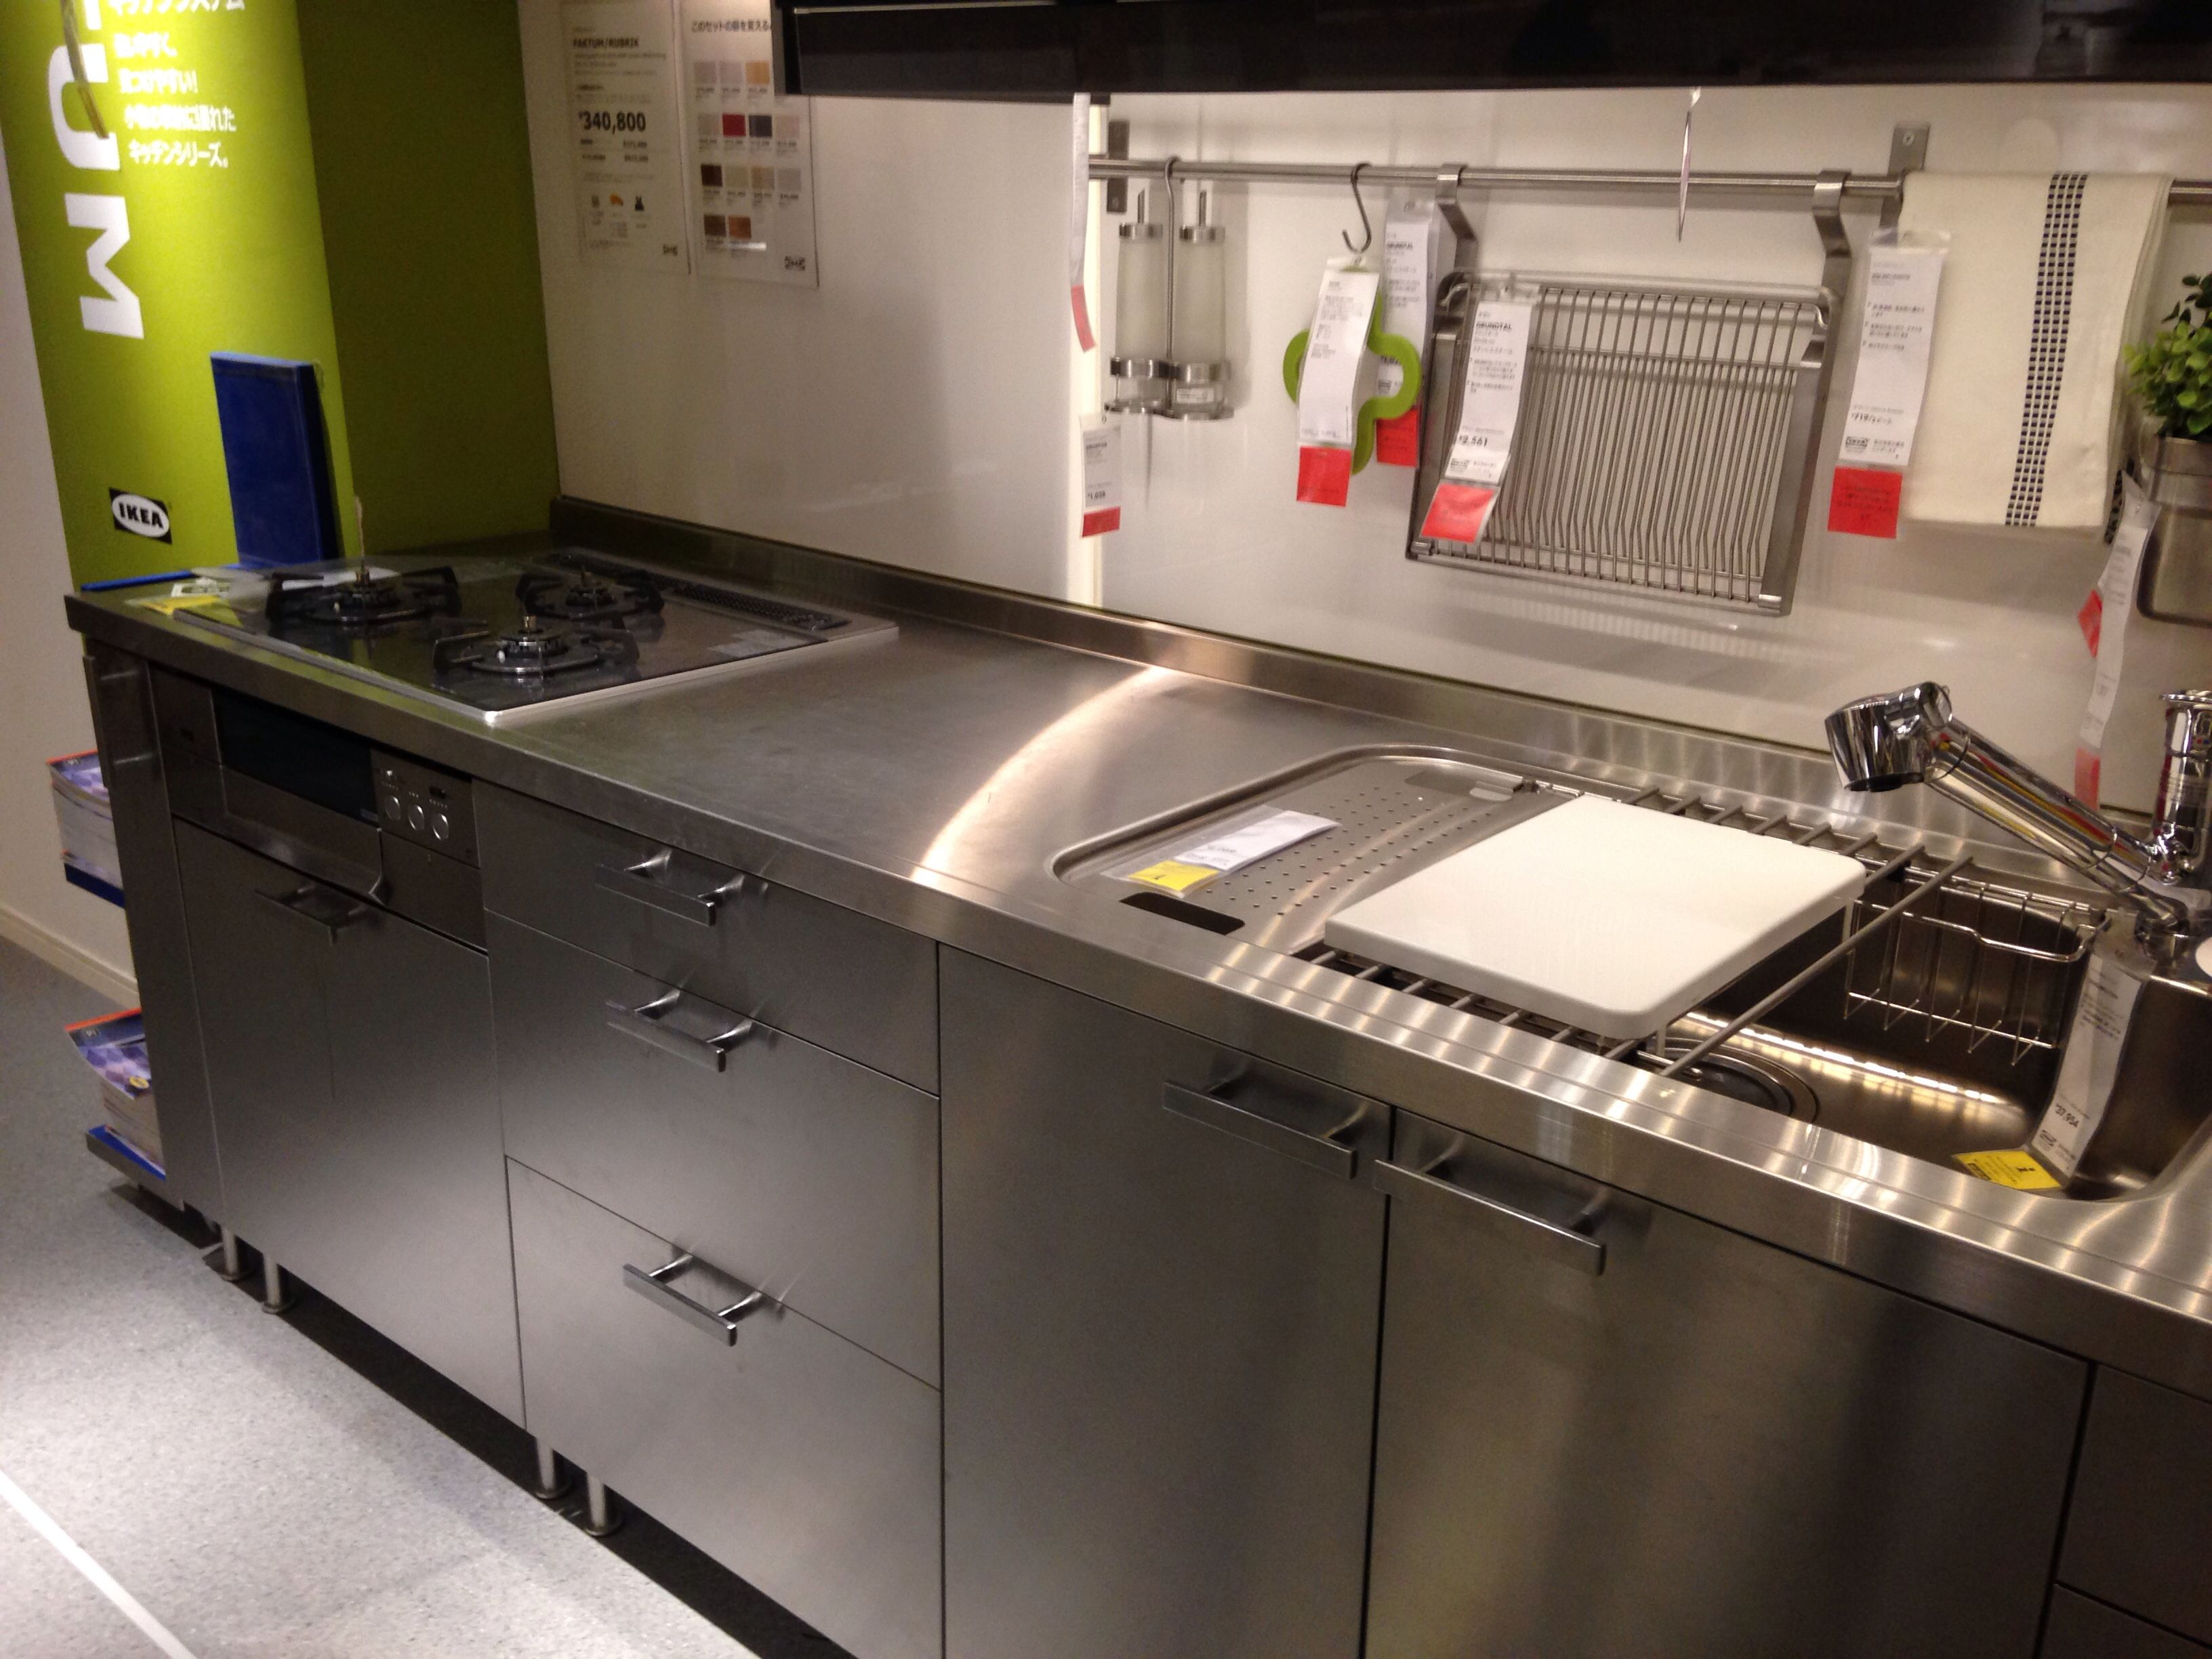 Ikea Kitchen ステンレスワークトップ ハイグロスグレー